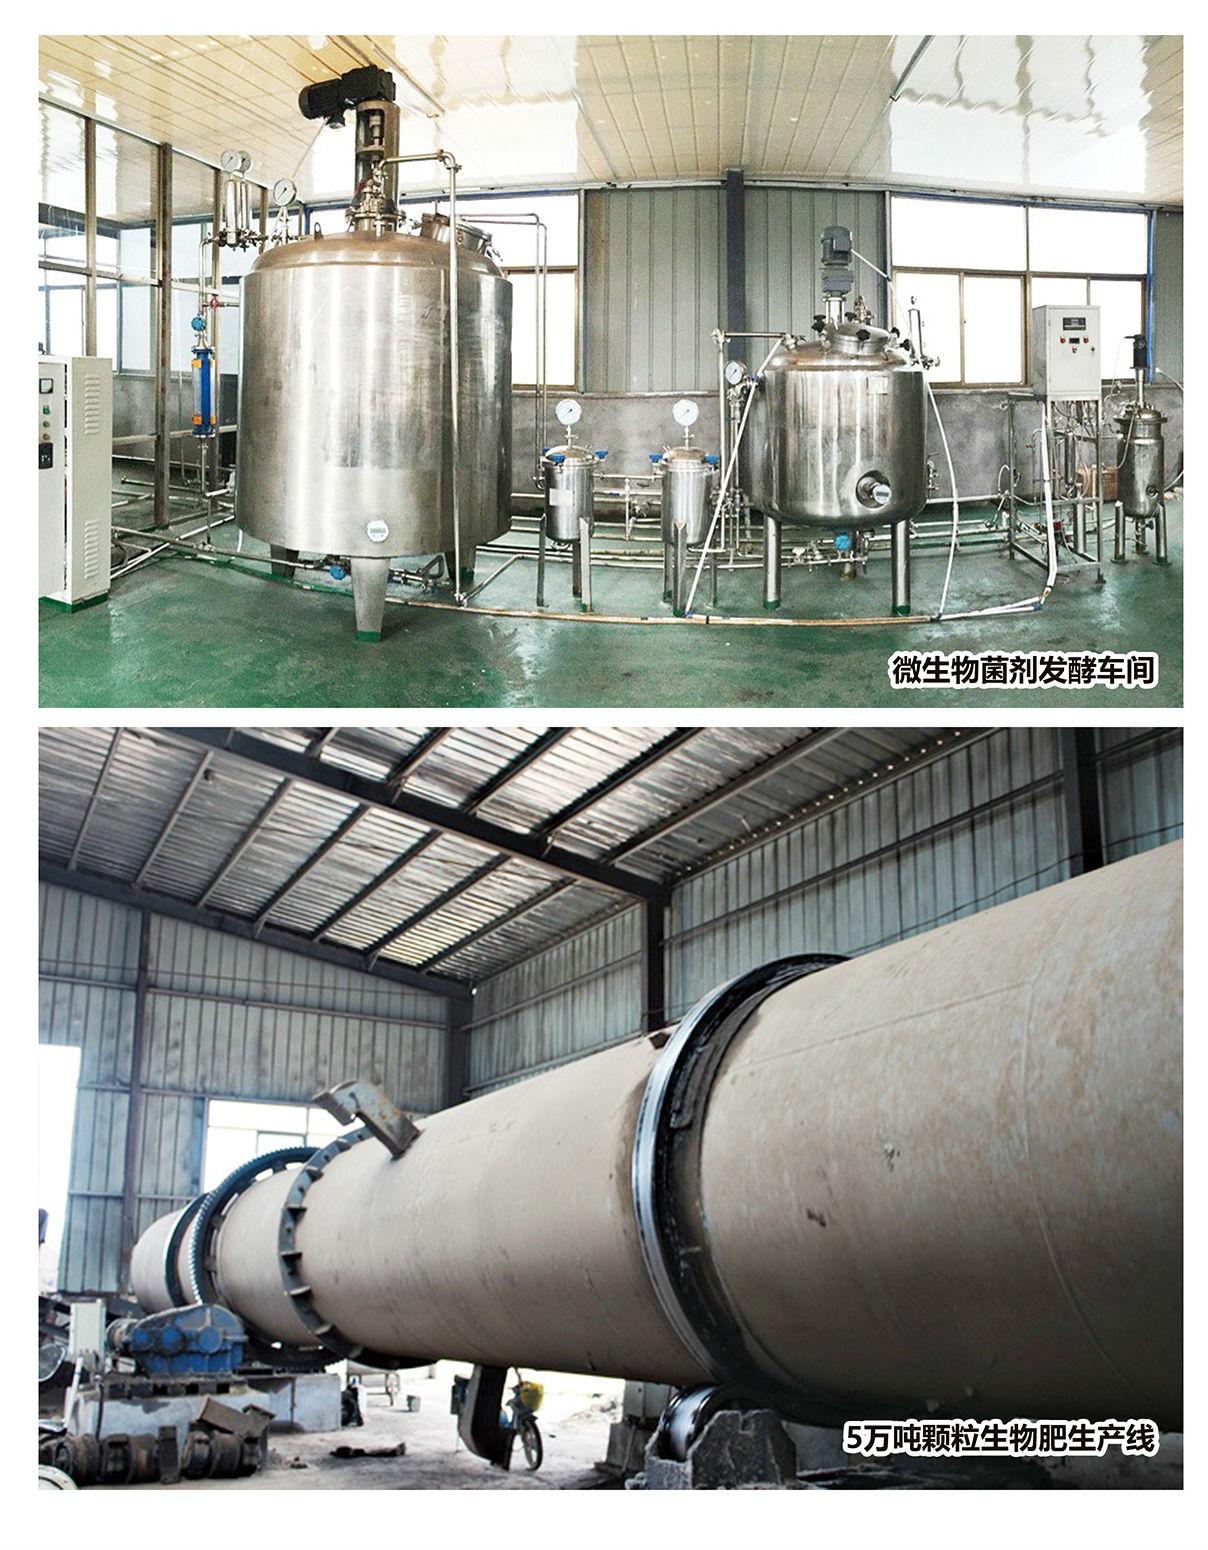 c 菌剂车间和5万吨生产线.jpg